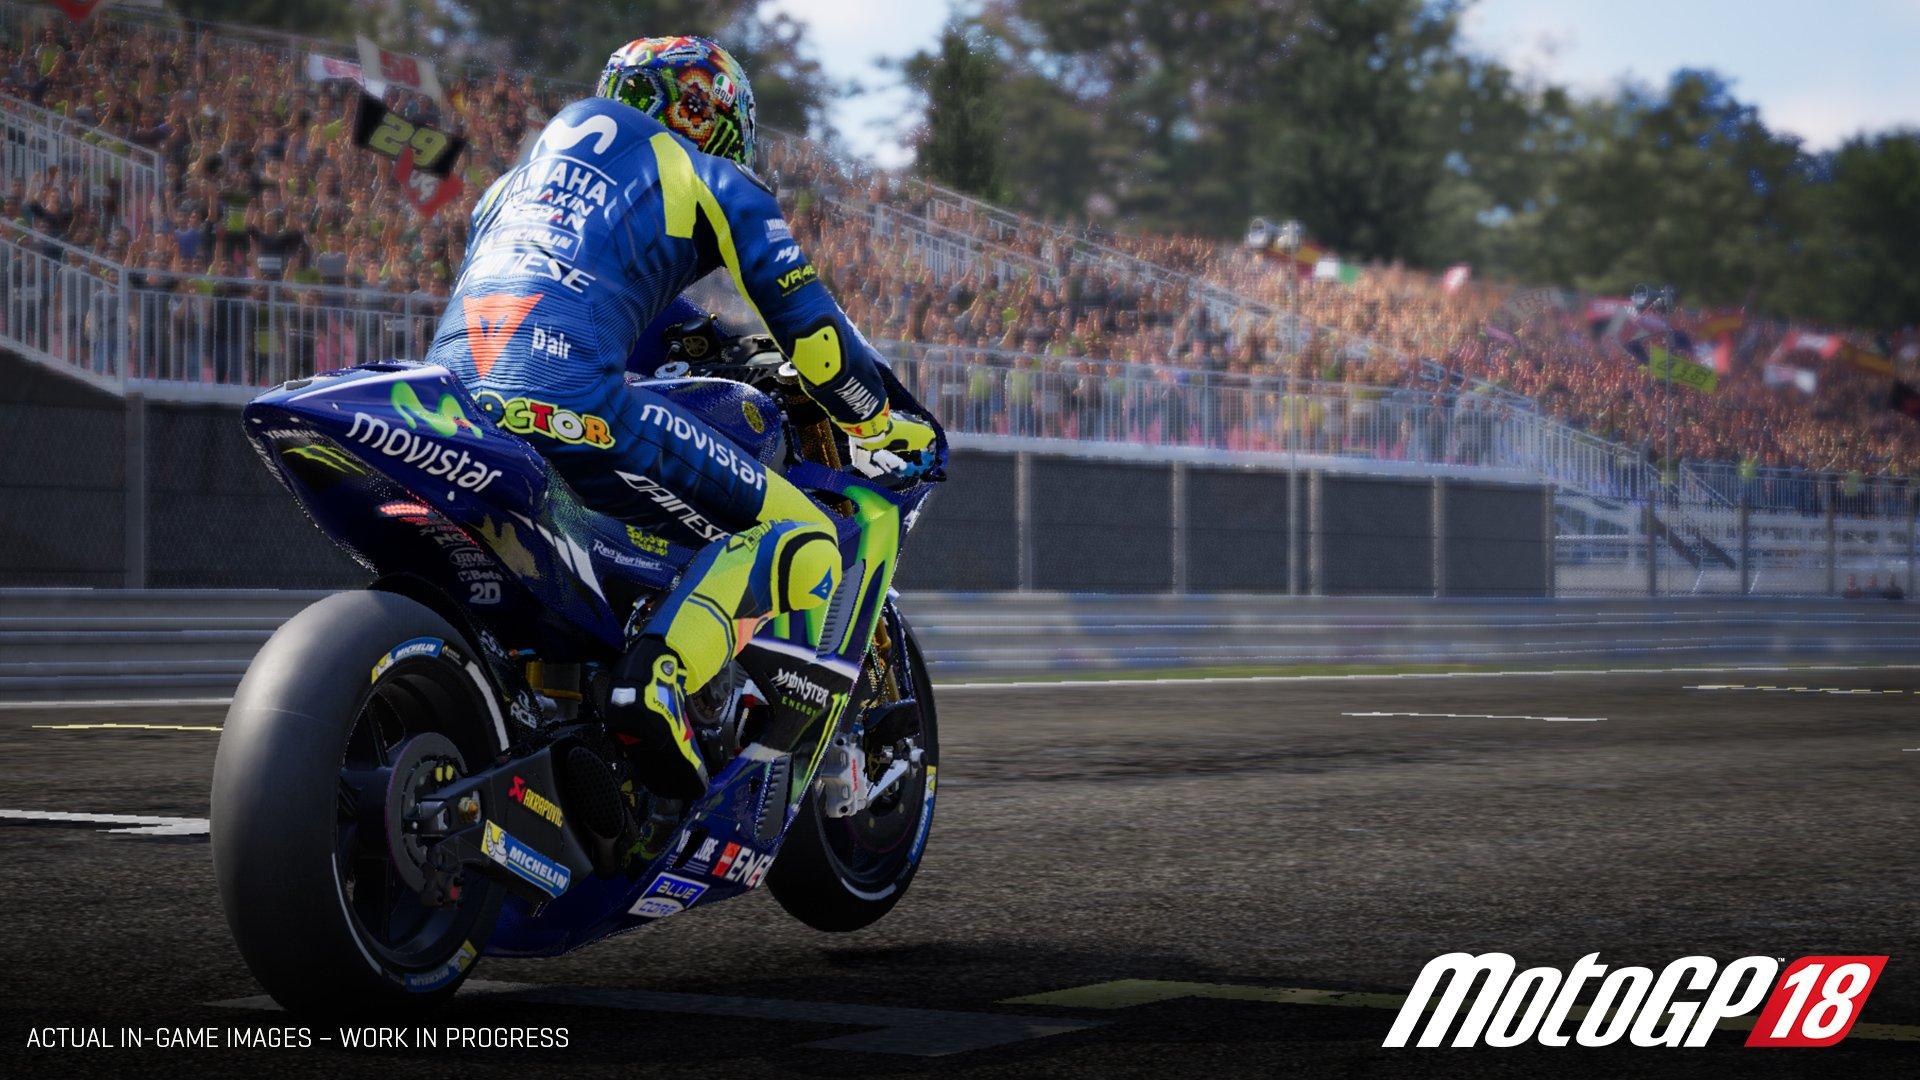 MotoGP 18 preview 12